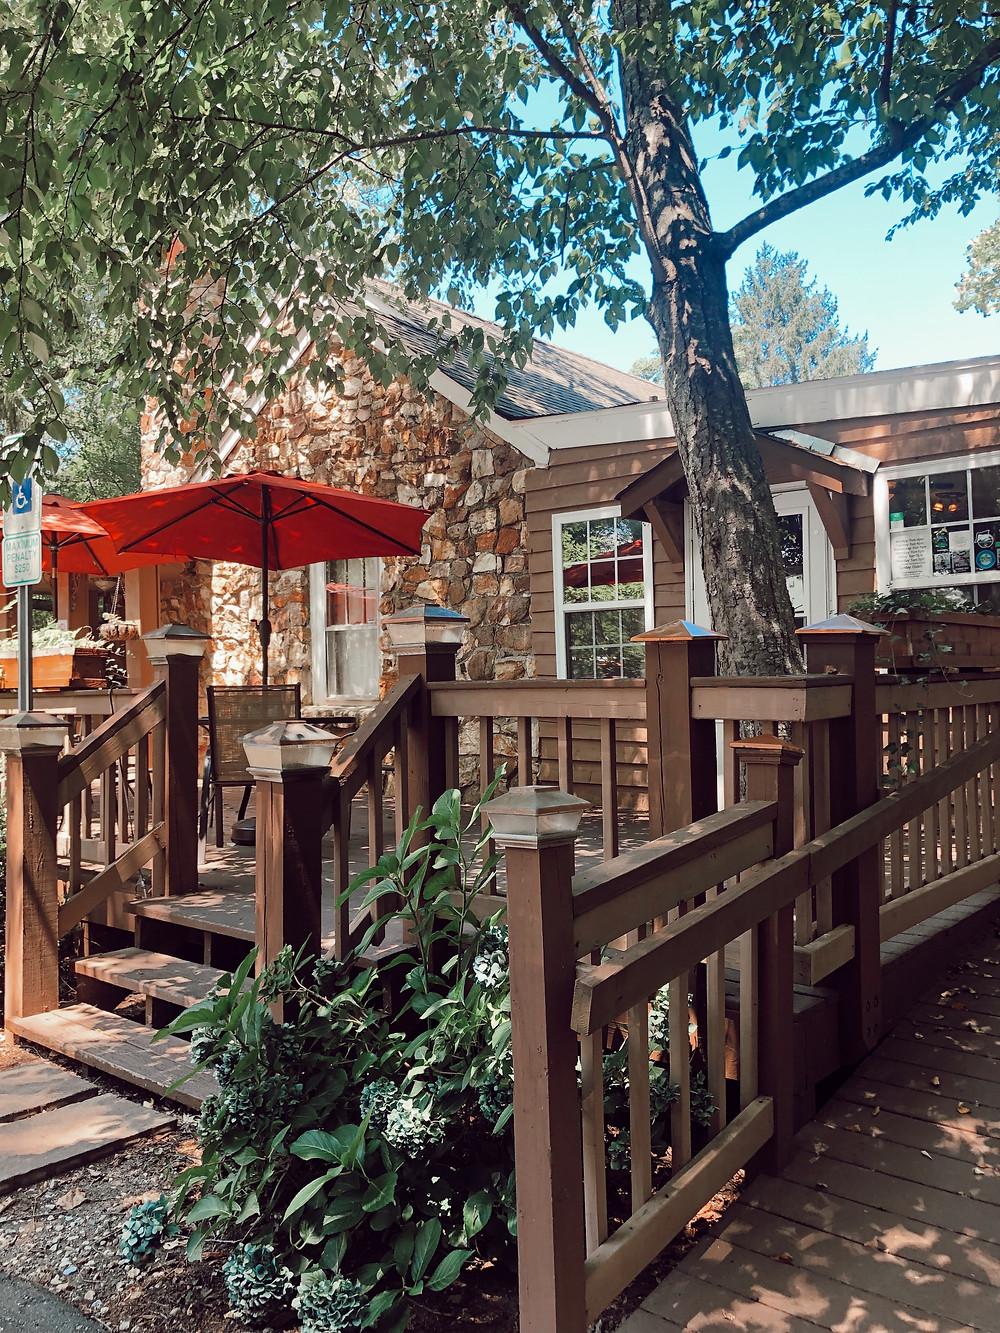 Ivory Road restaurant, South Asheville, Asheville's Hidden Gems, Best Local Restaurants and Breweries, Local Favorites, Asheville Lifestyle Blog, Travel Guide